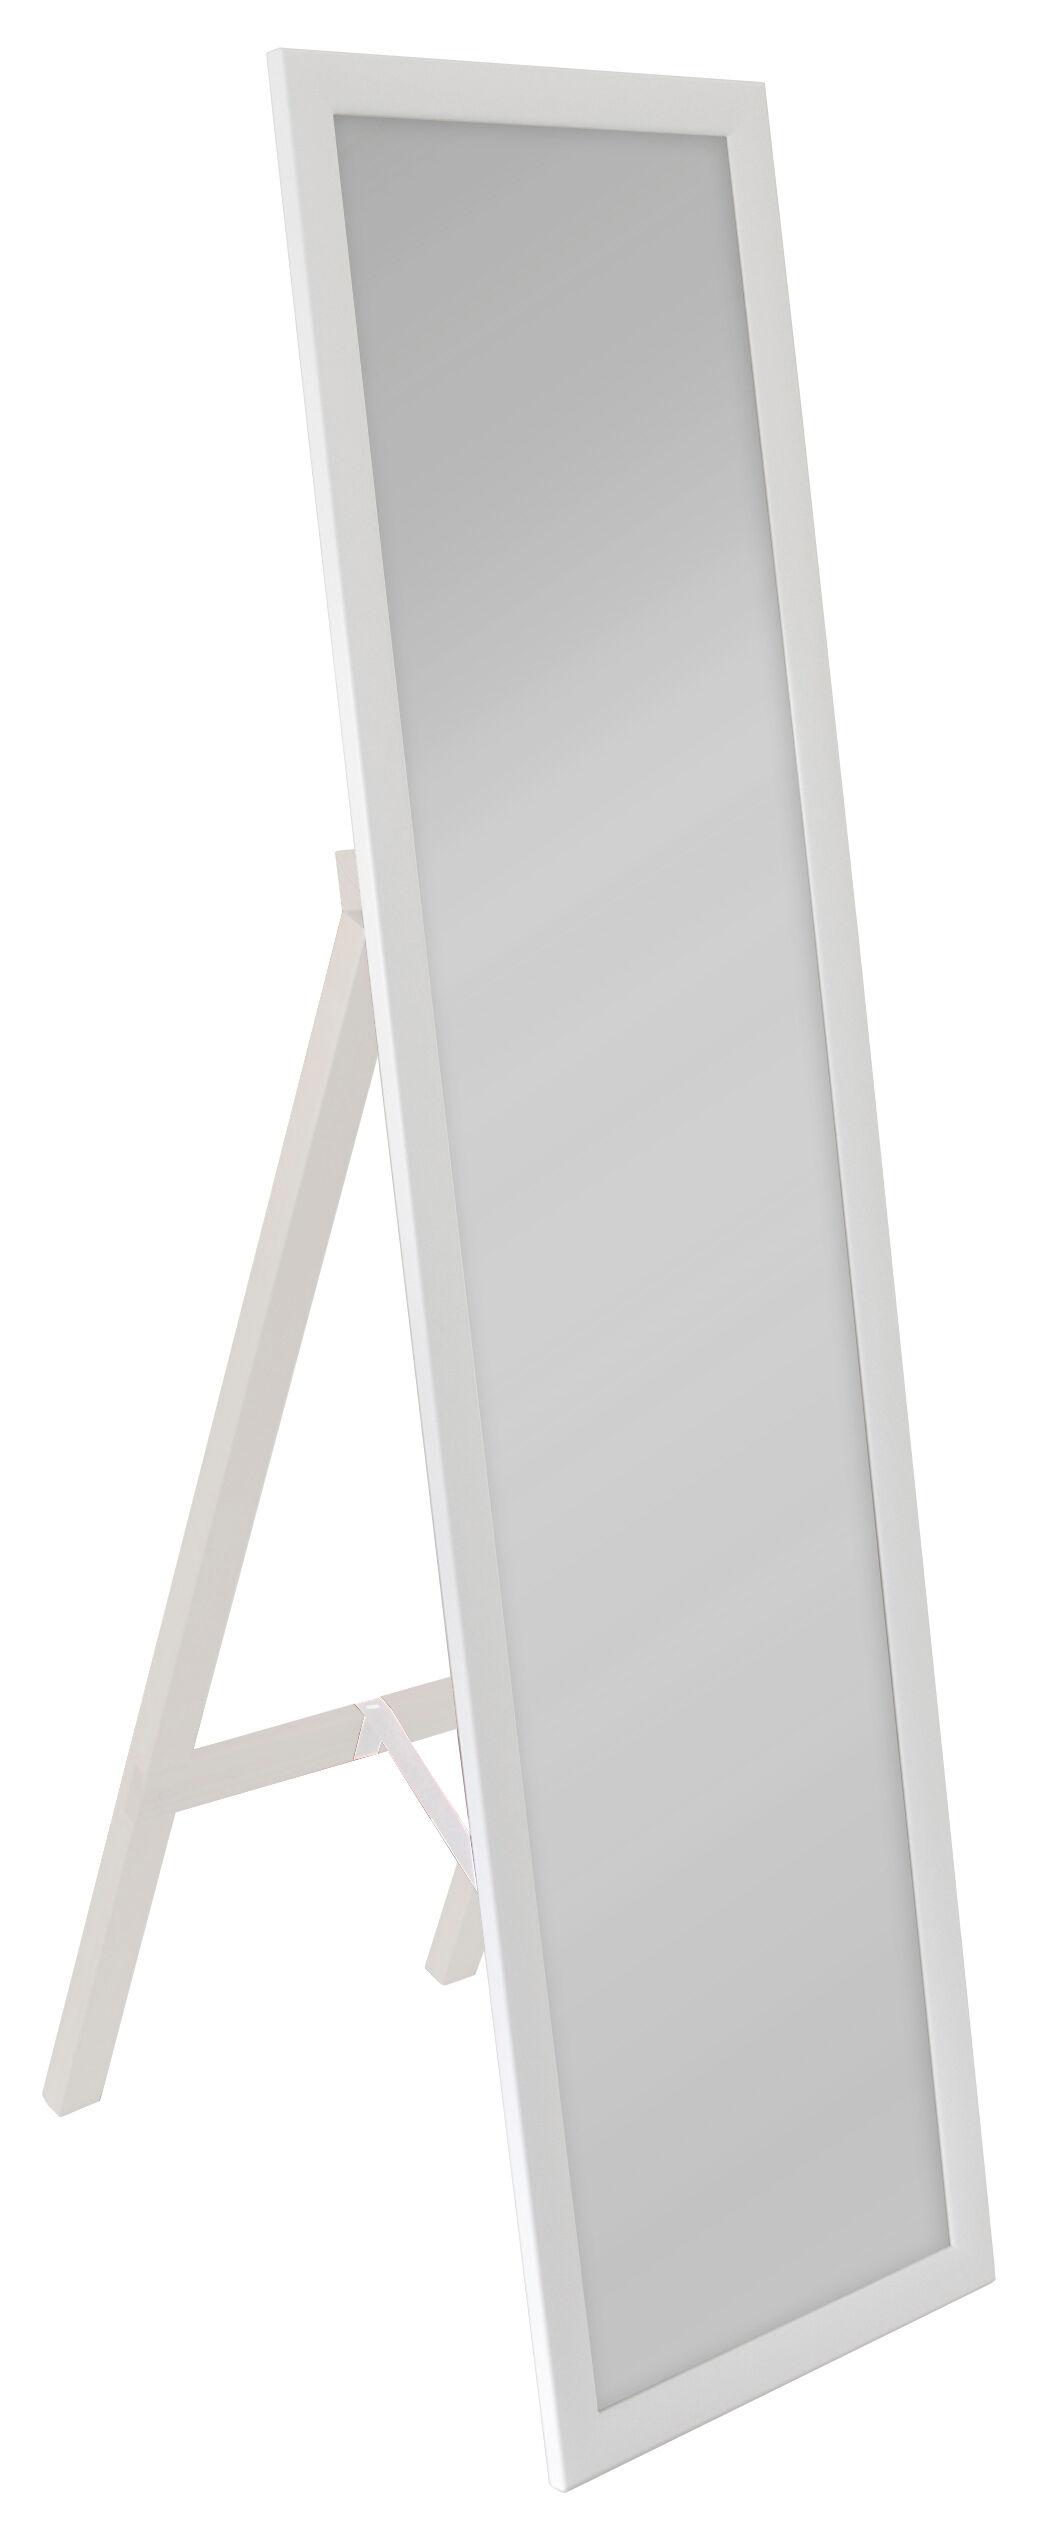 Artlink Peili Markus Valkoinen 40x160 cm